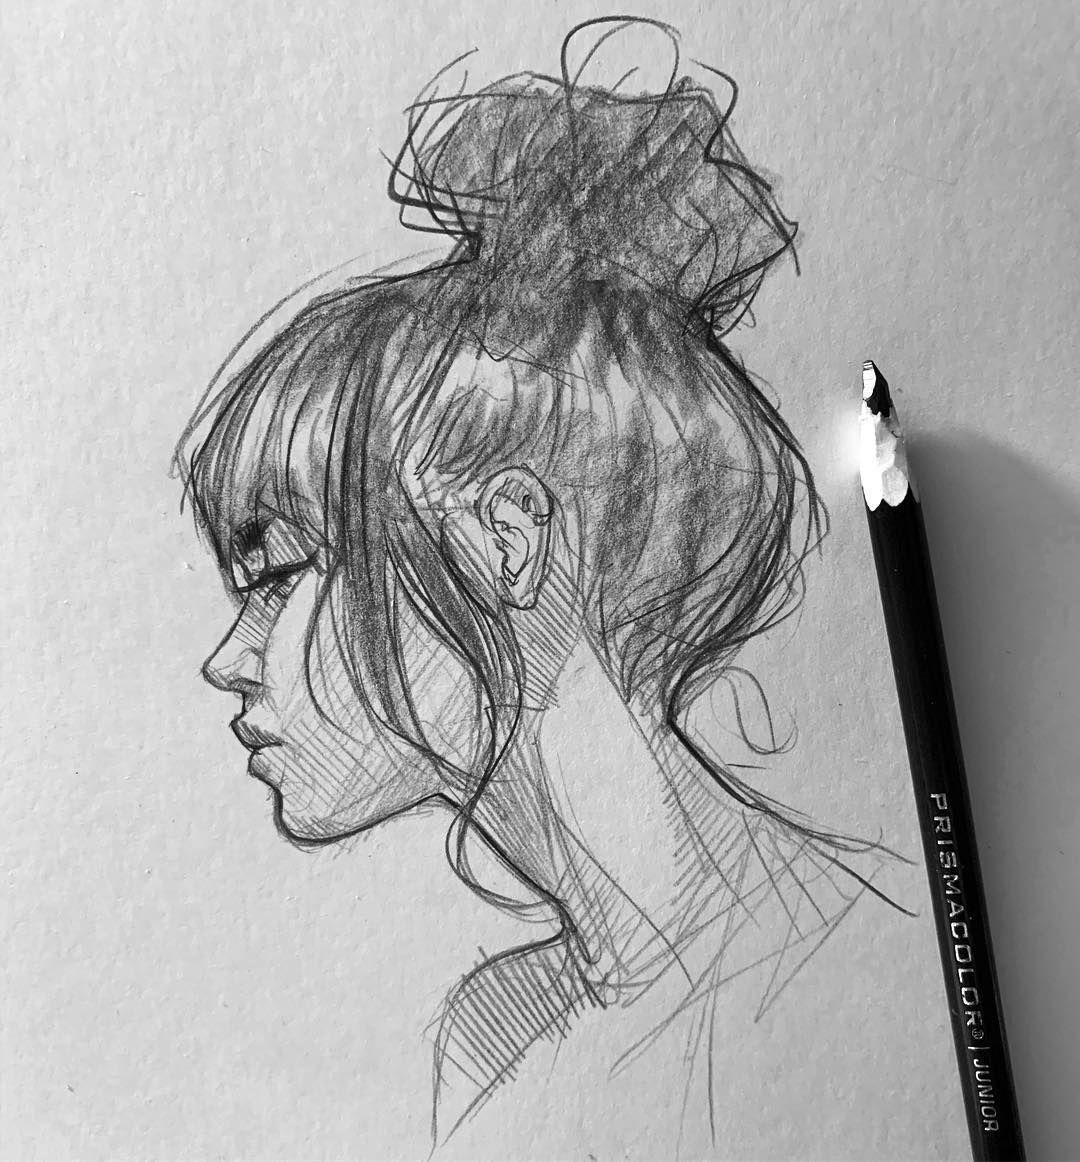 Pencil Sketch Artist Efrain Malo Sketches Art Drawings Sketches